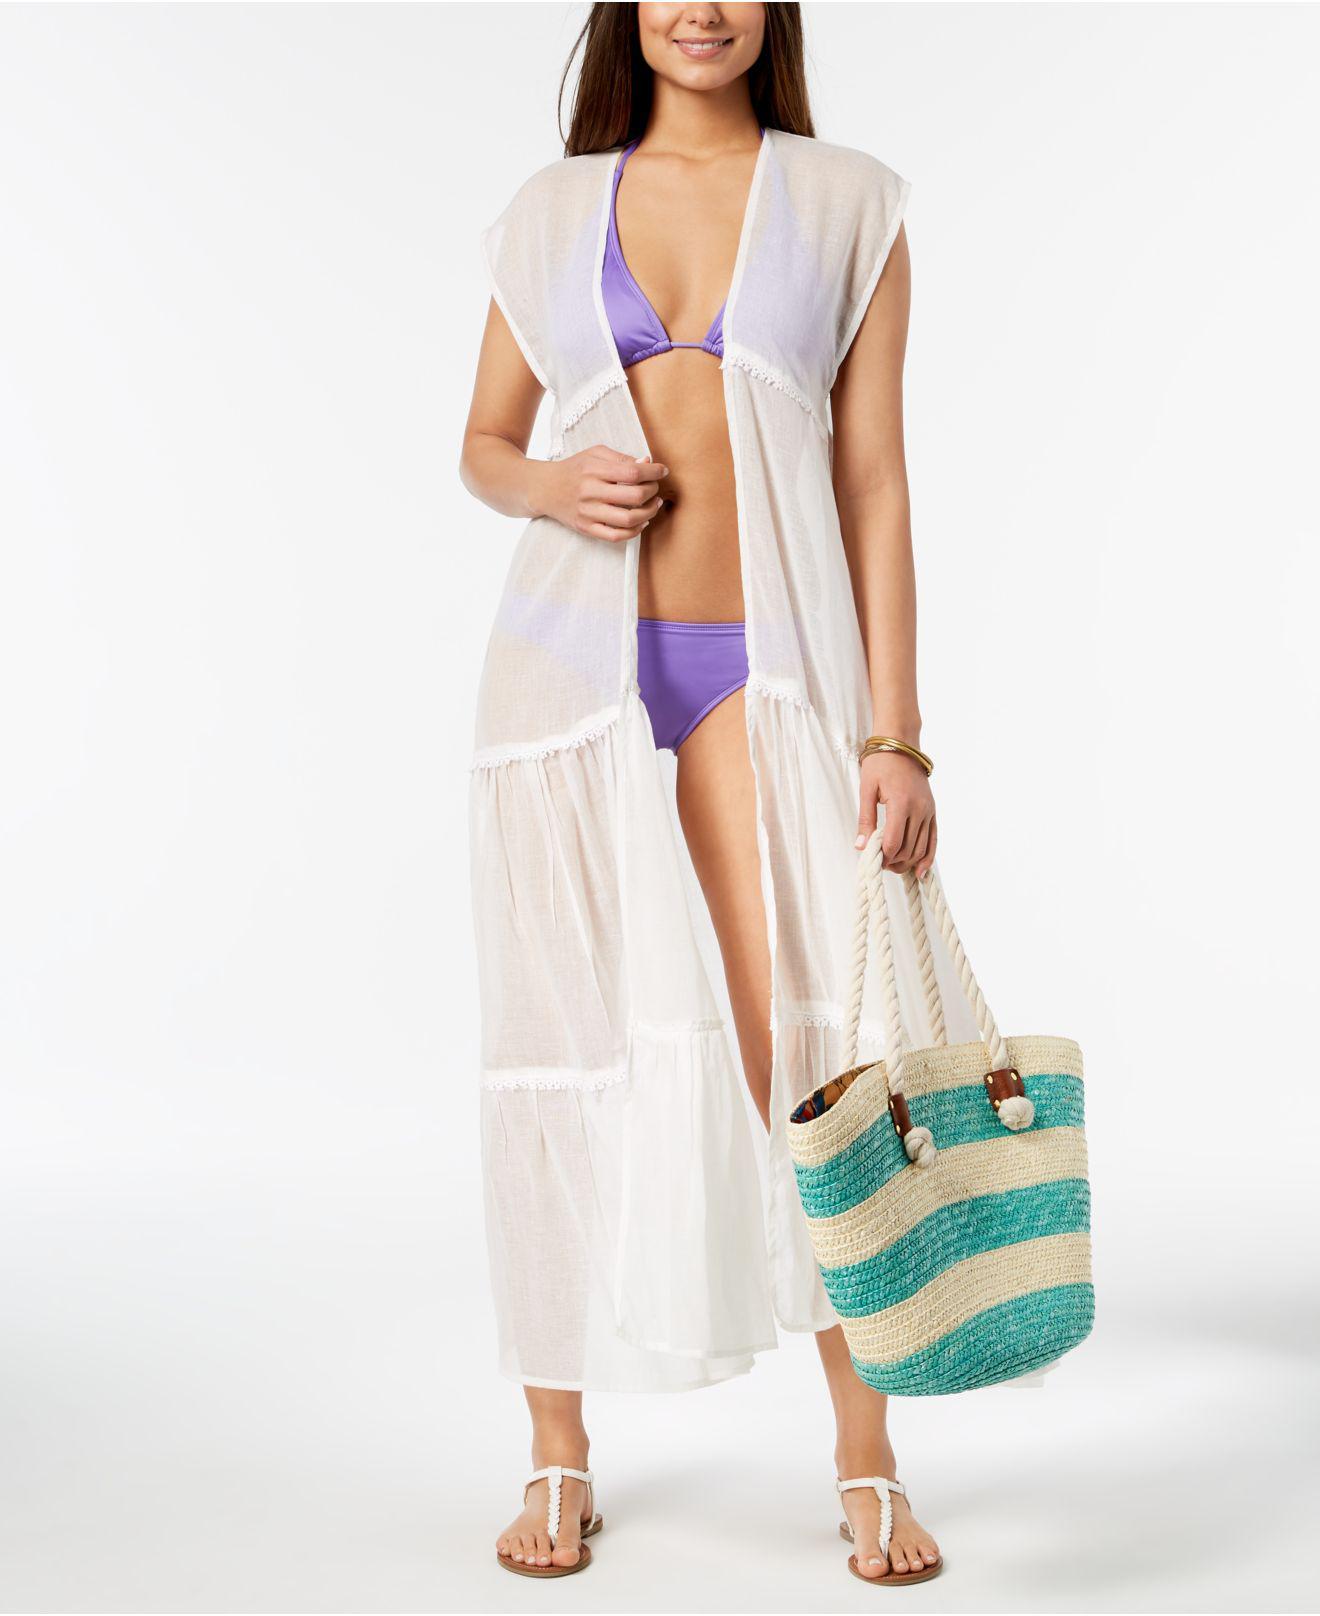 426295f7c7 Betsey Johnson Prairie Girl Cover-up & Kimono in White - Lyst